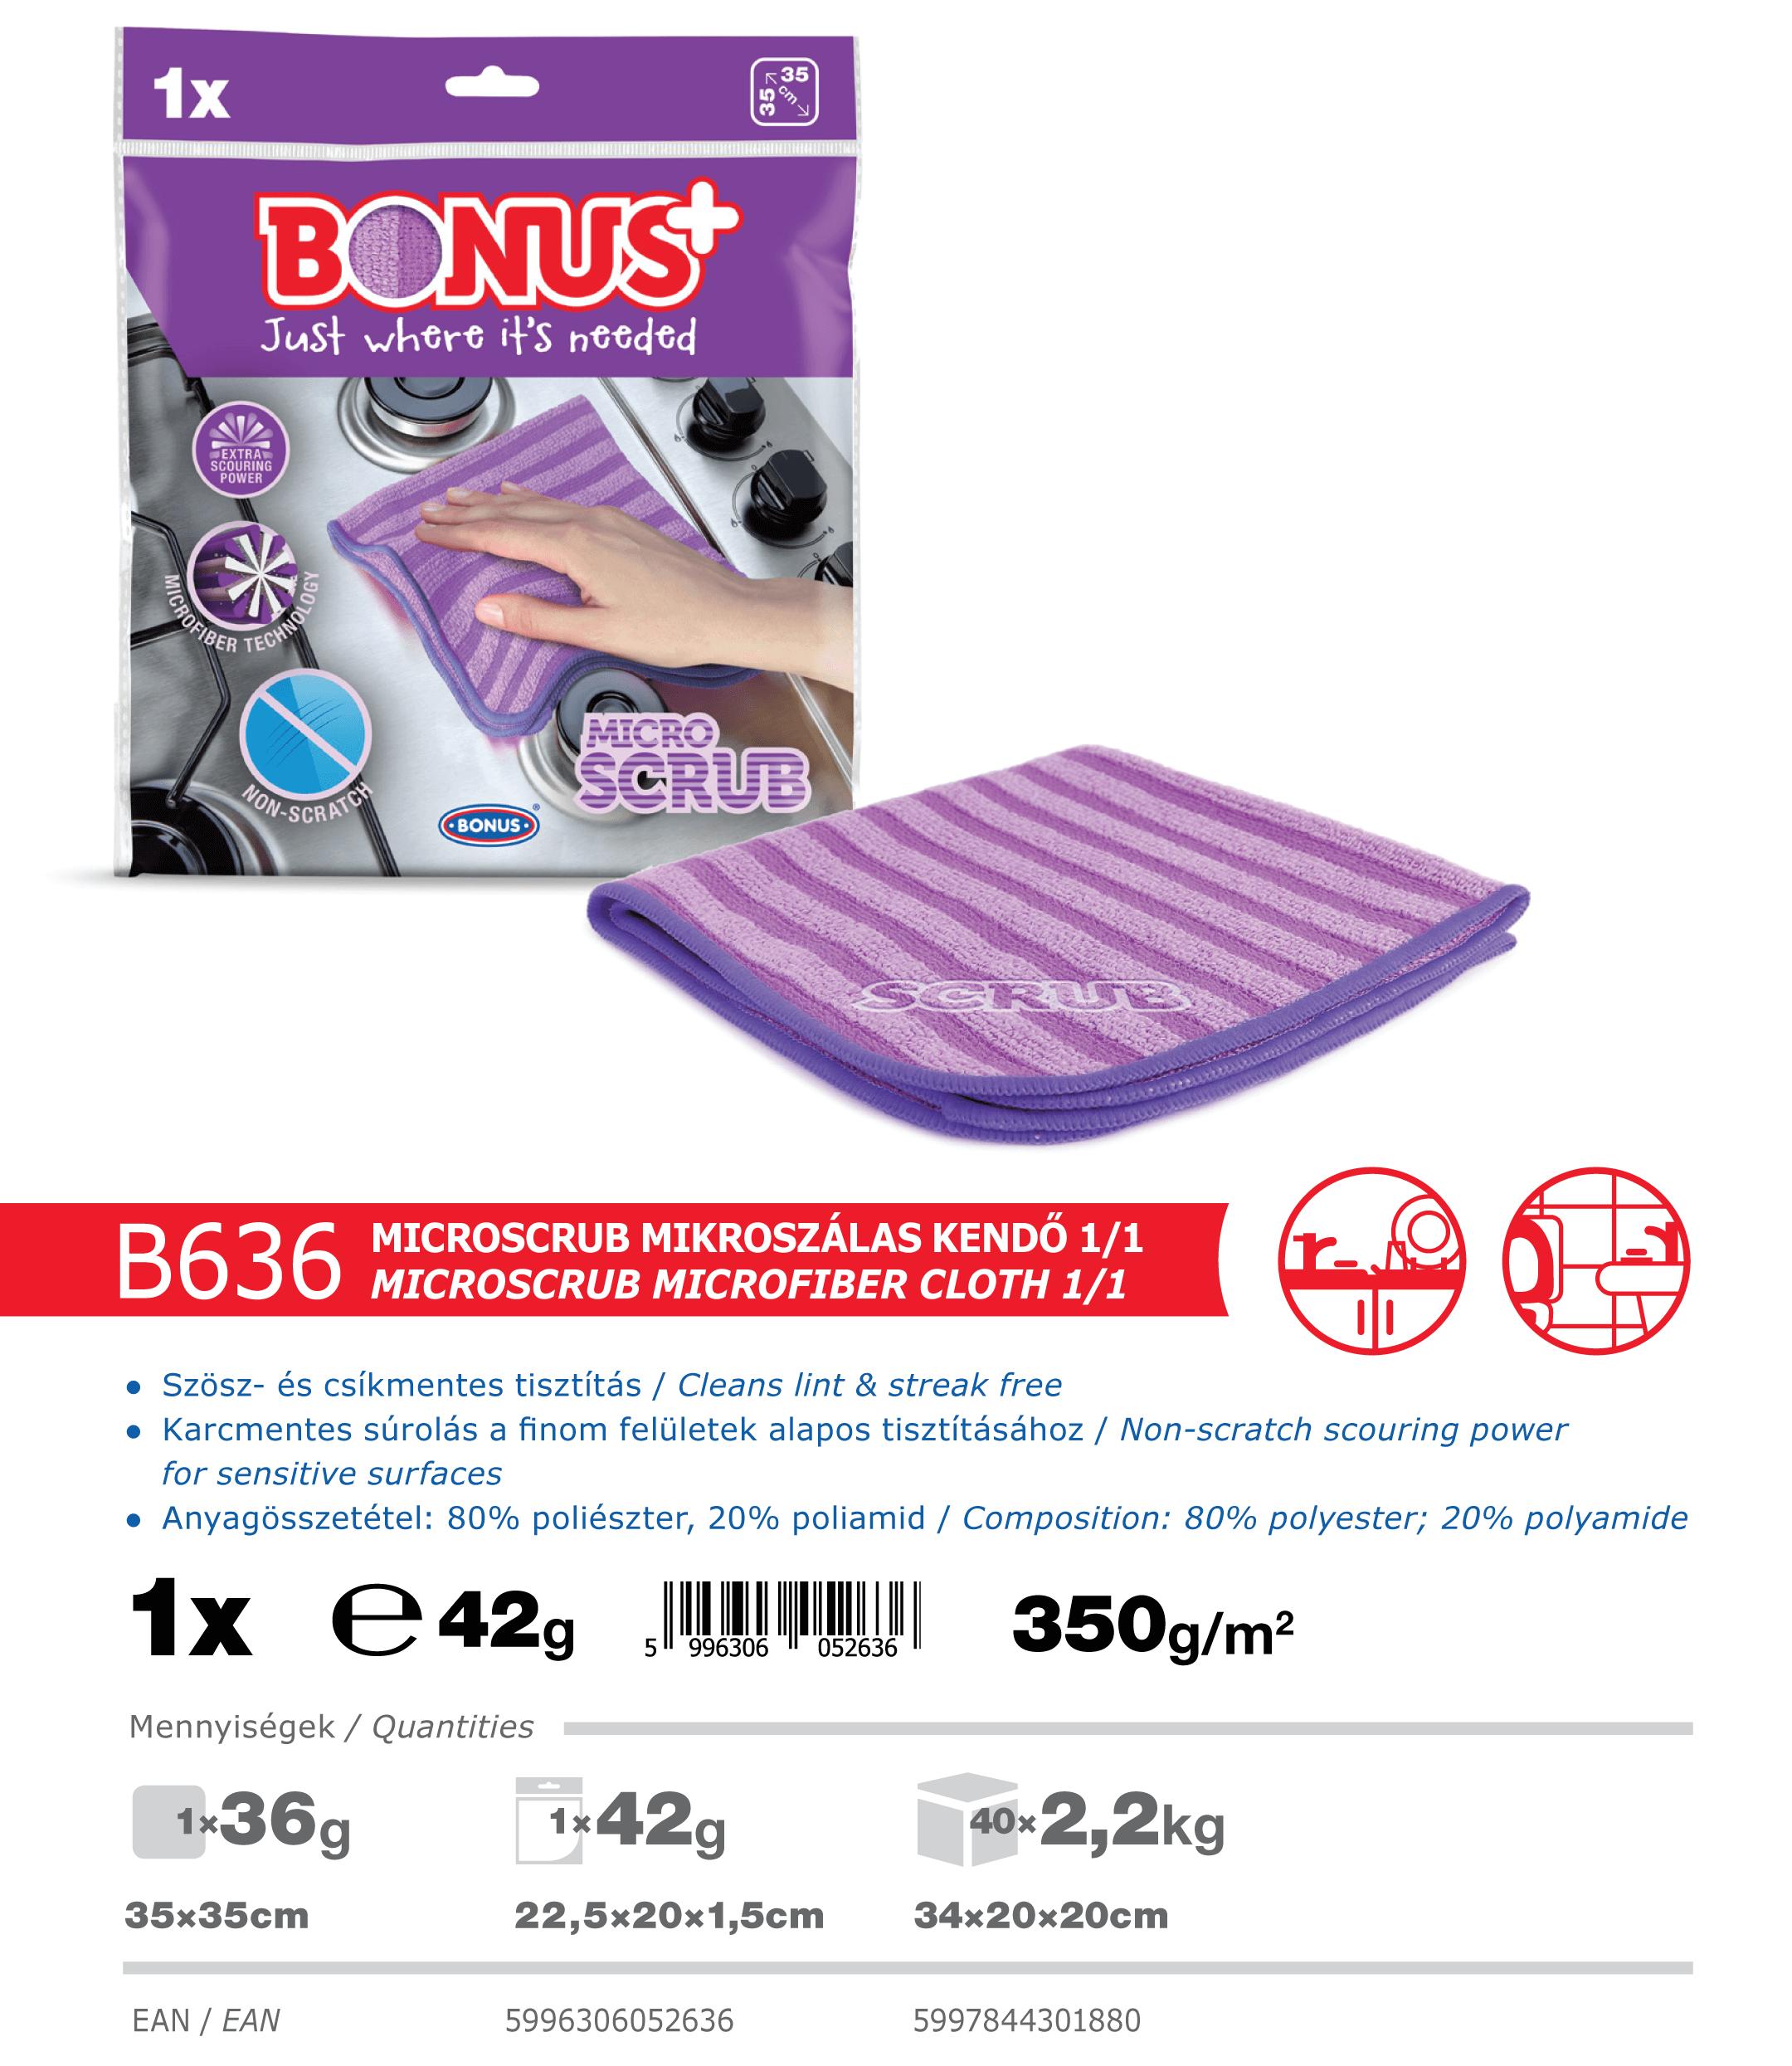 B636 Bonus+ MicroSCRUB kendő 1/1 katalógus adatok